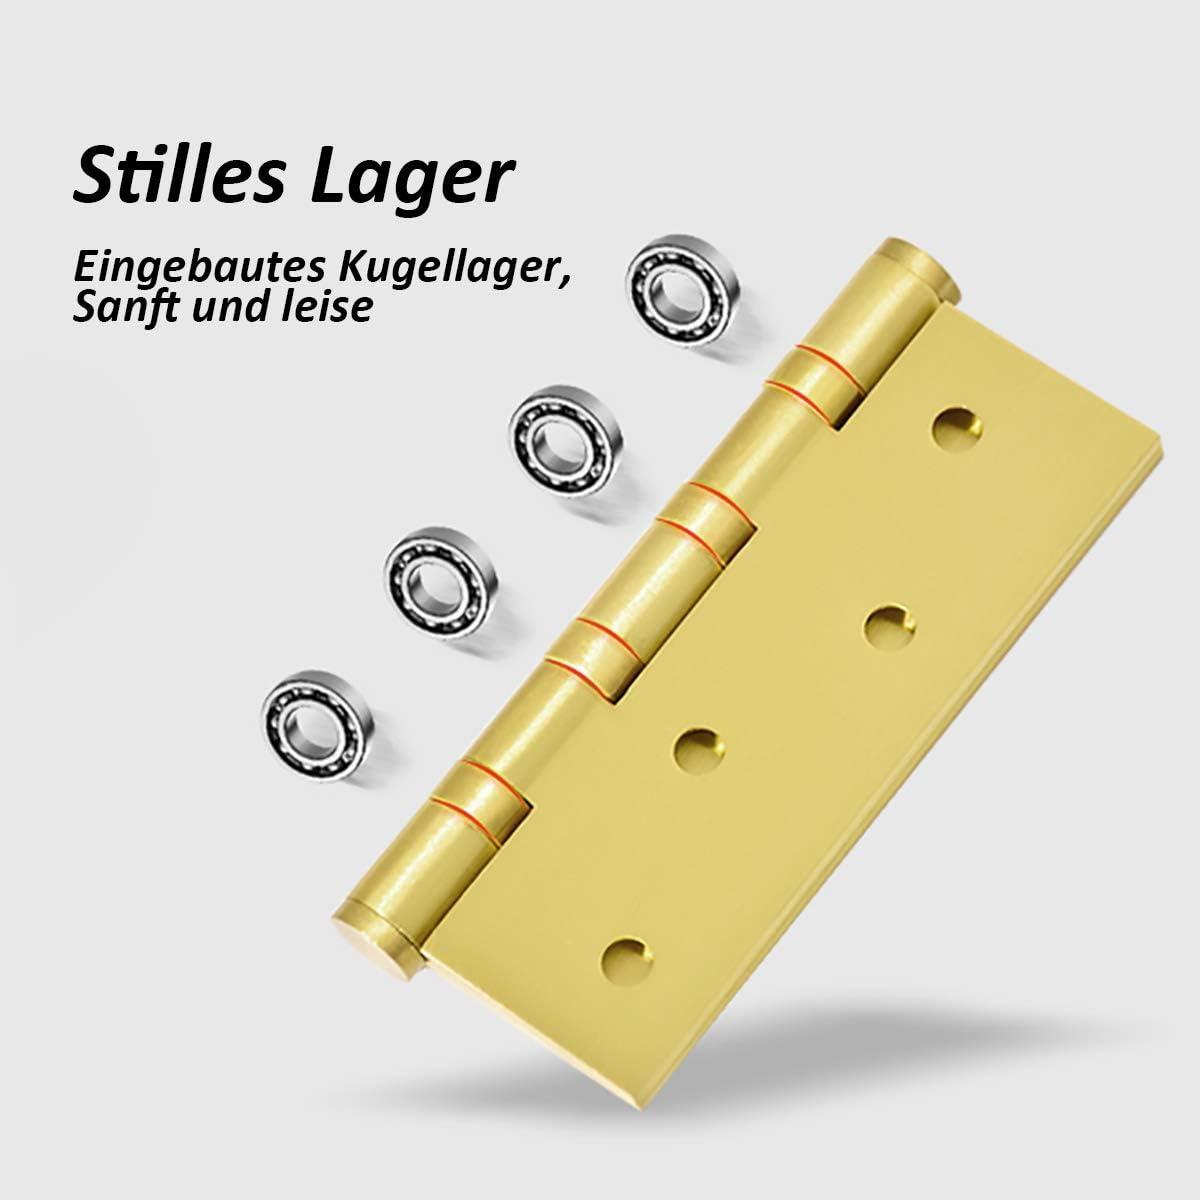 TSSS 1 Paar 100 x 76 mm Solide 56 Messing Scharniere Verdicktes T/ürangeln Steckverbinder Softclose Kugellager